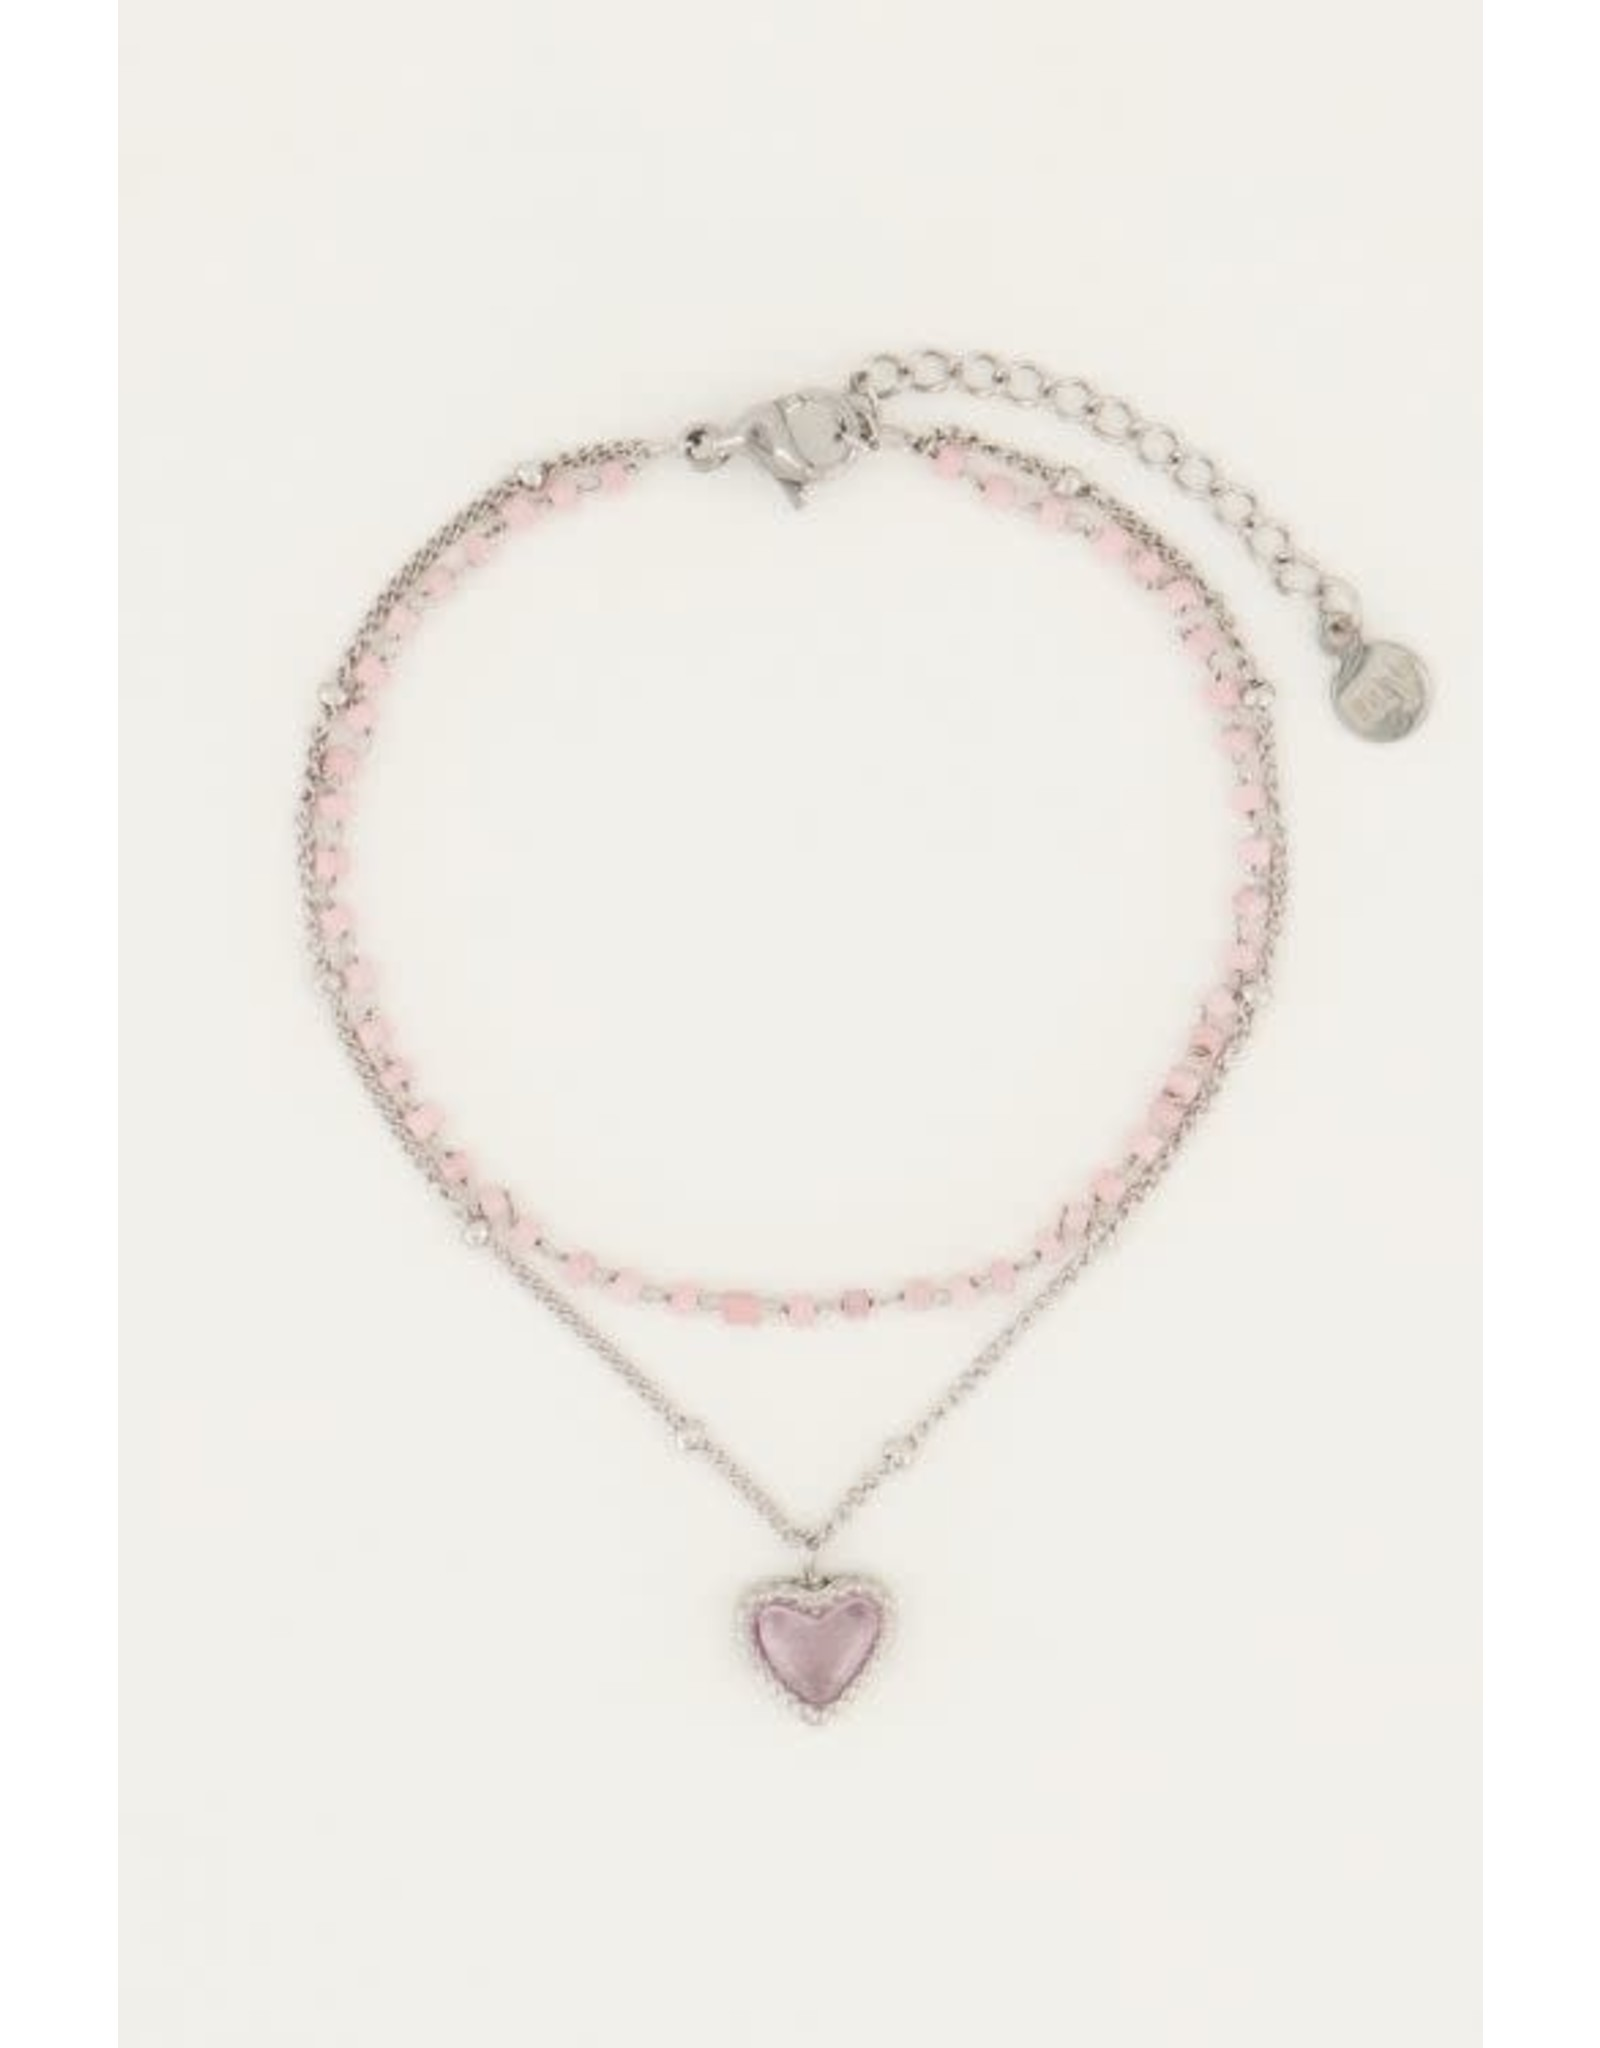 My Jewellery My Jewellery roze kralenarmbandje met hartje